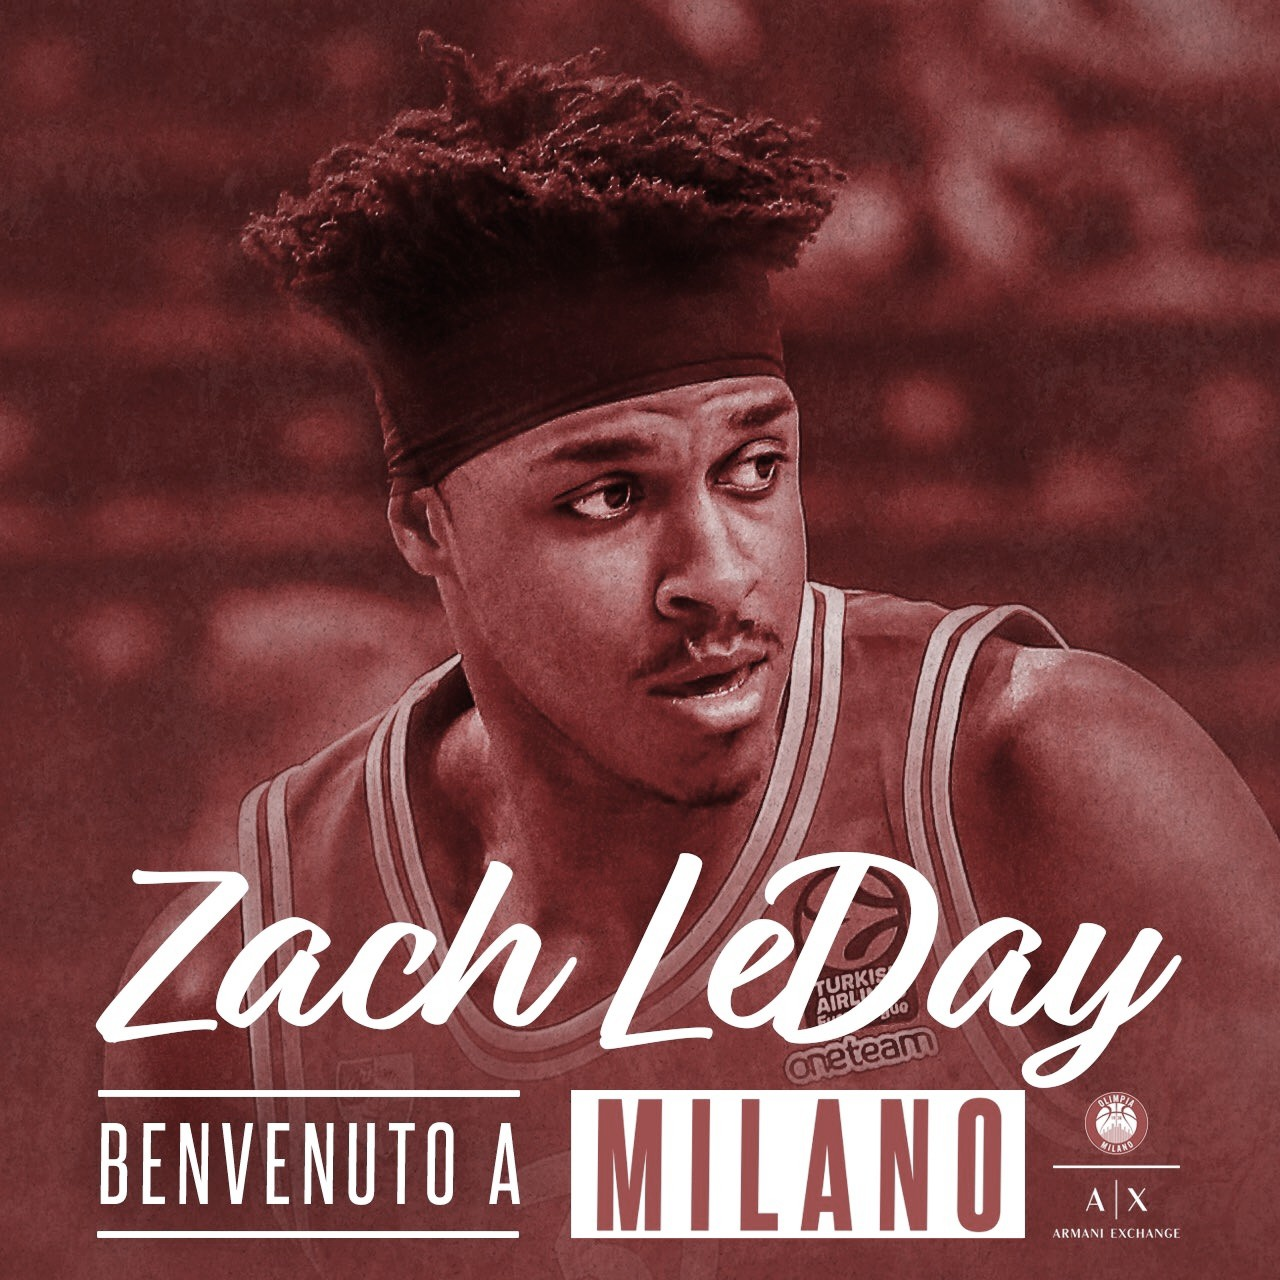 Zach LeDay, octava pieza del rompecabezas de Armani Milán